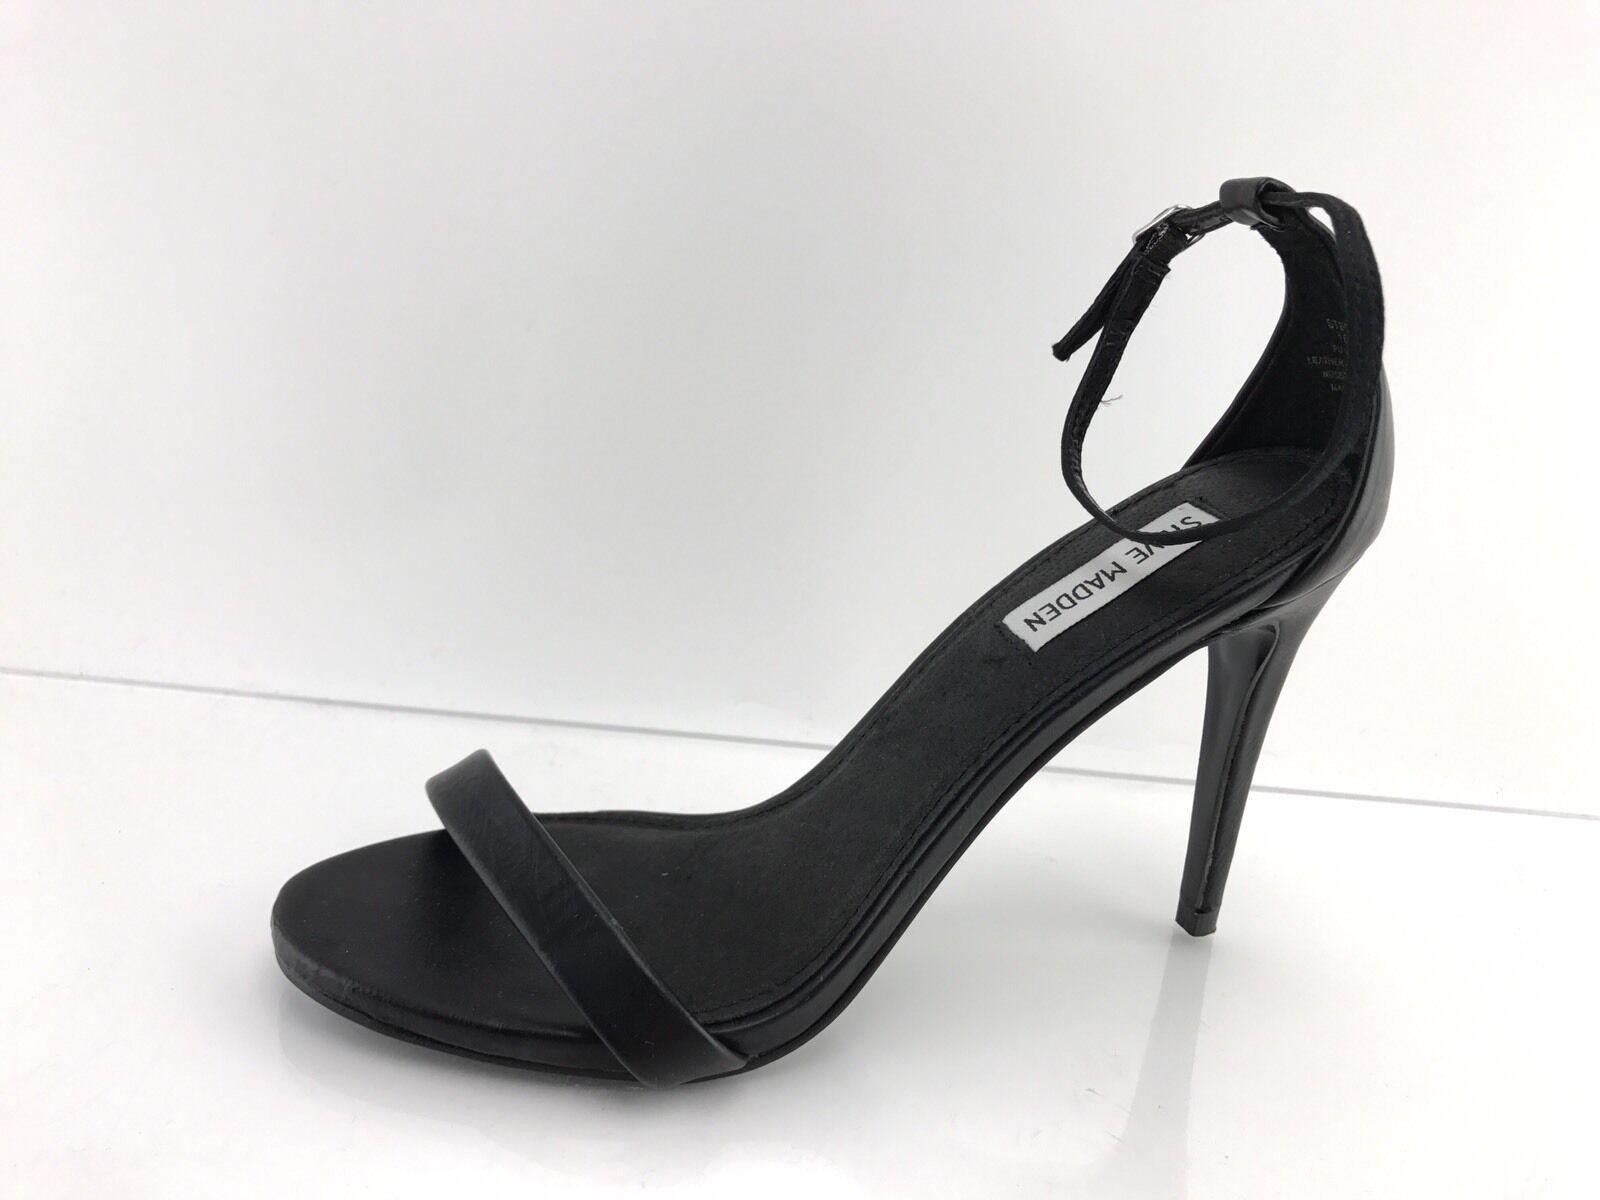 promozioni di sconto Steve Madden Stecy Donna    nero Leather Strap Ankle High Heel Sandals 10 M  outlet in vendita